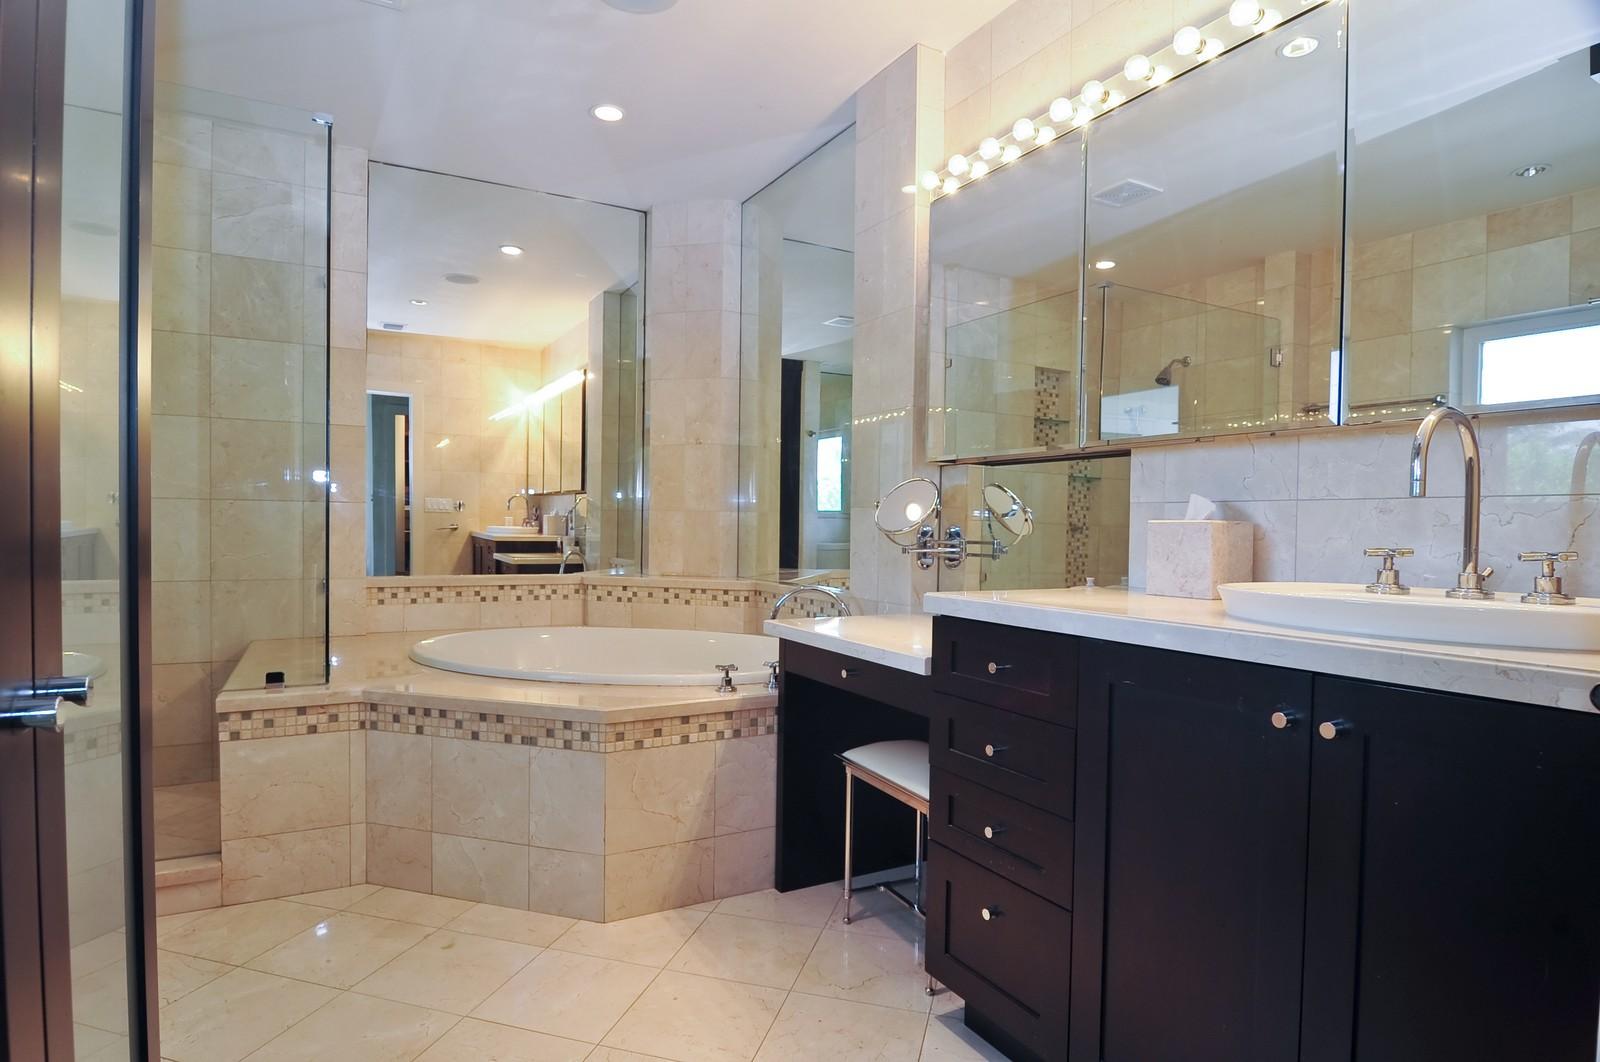 Real Estate Photography - 1231 Kane Concourse, Bay Harbor Islands, FL, 33154 - Master Bathroom